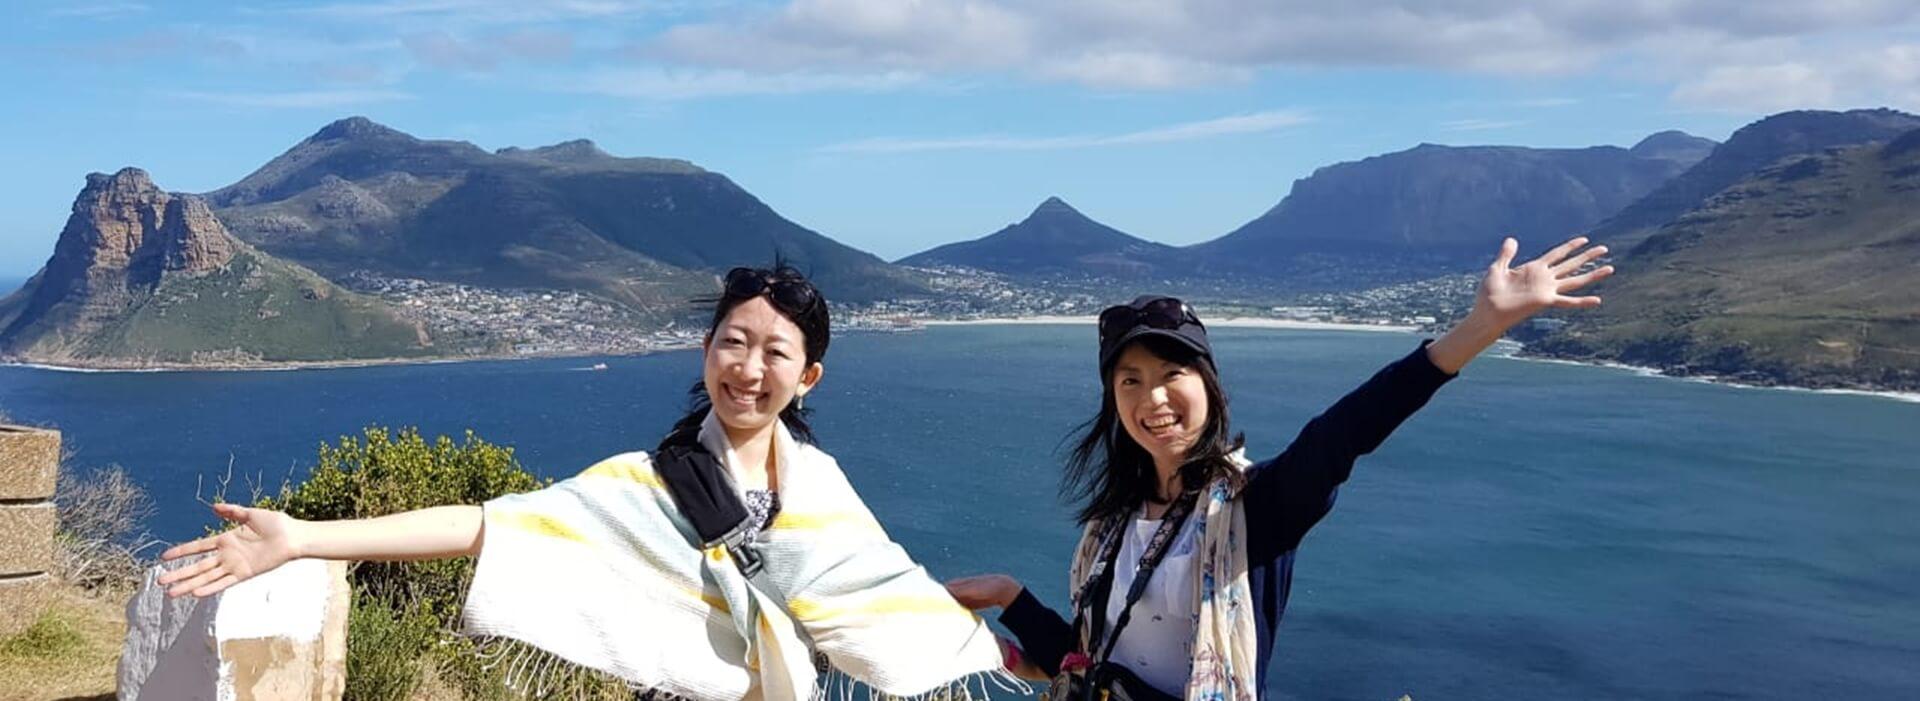 cape peninsula tour - the wine specialists